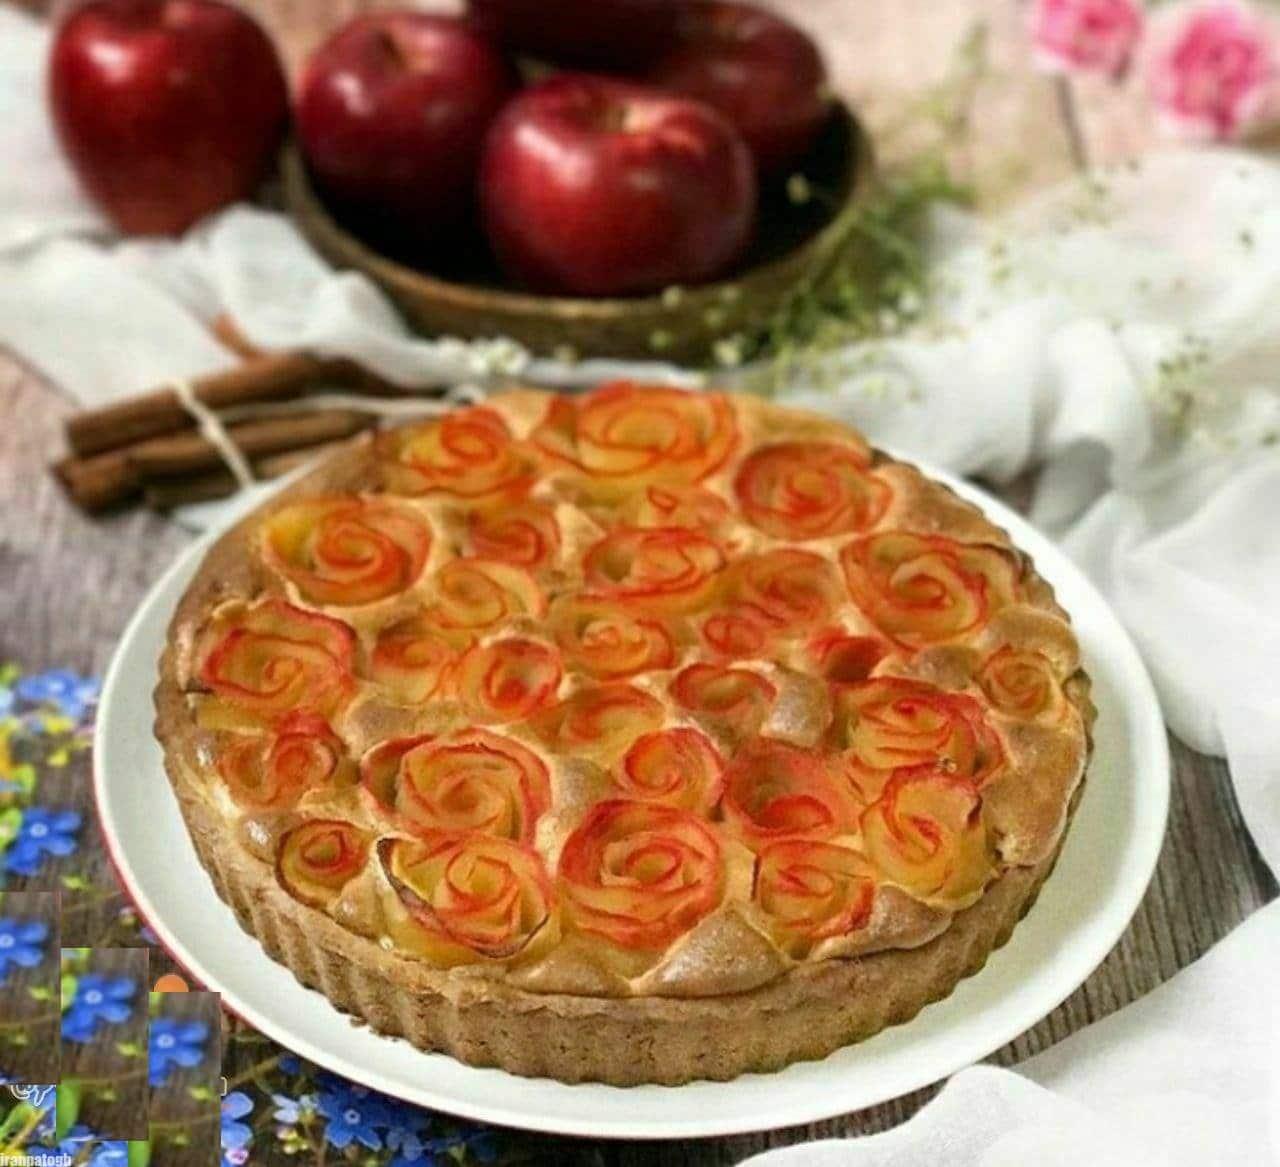 photo 2021 06 07 12 35 50 - طرز تهیه تارت سیب خوشمزه و عالی دسر ویژه مهمانی و دورهمی